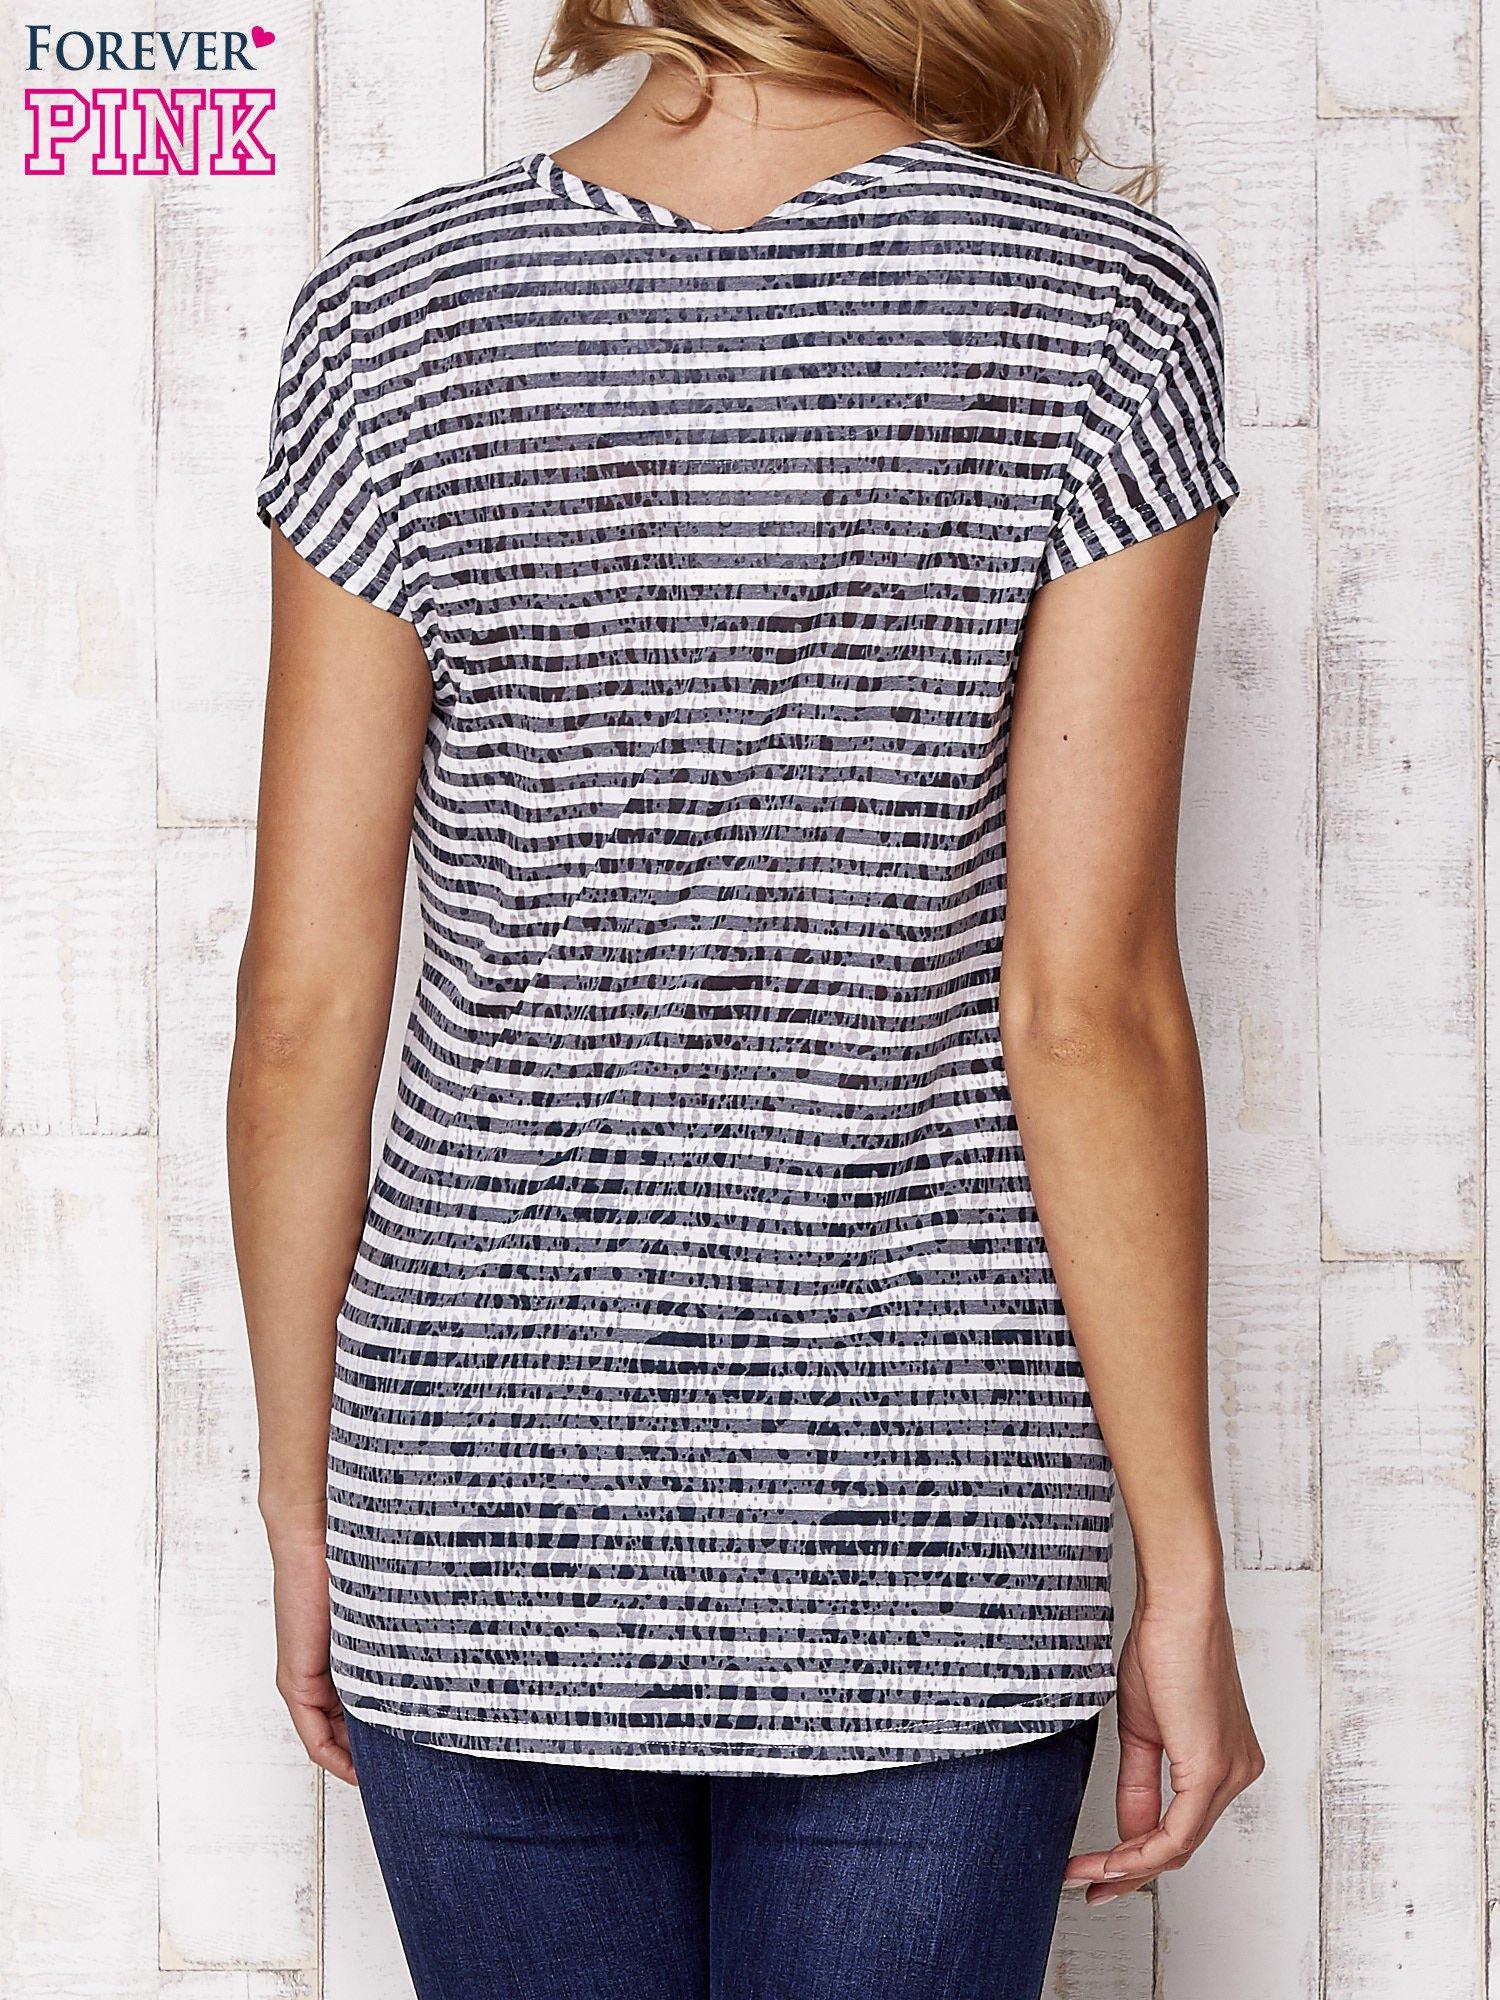 Szary fakturowany t-shirt w paski